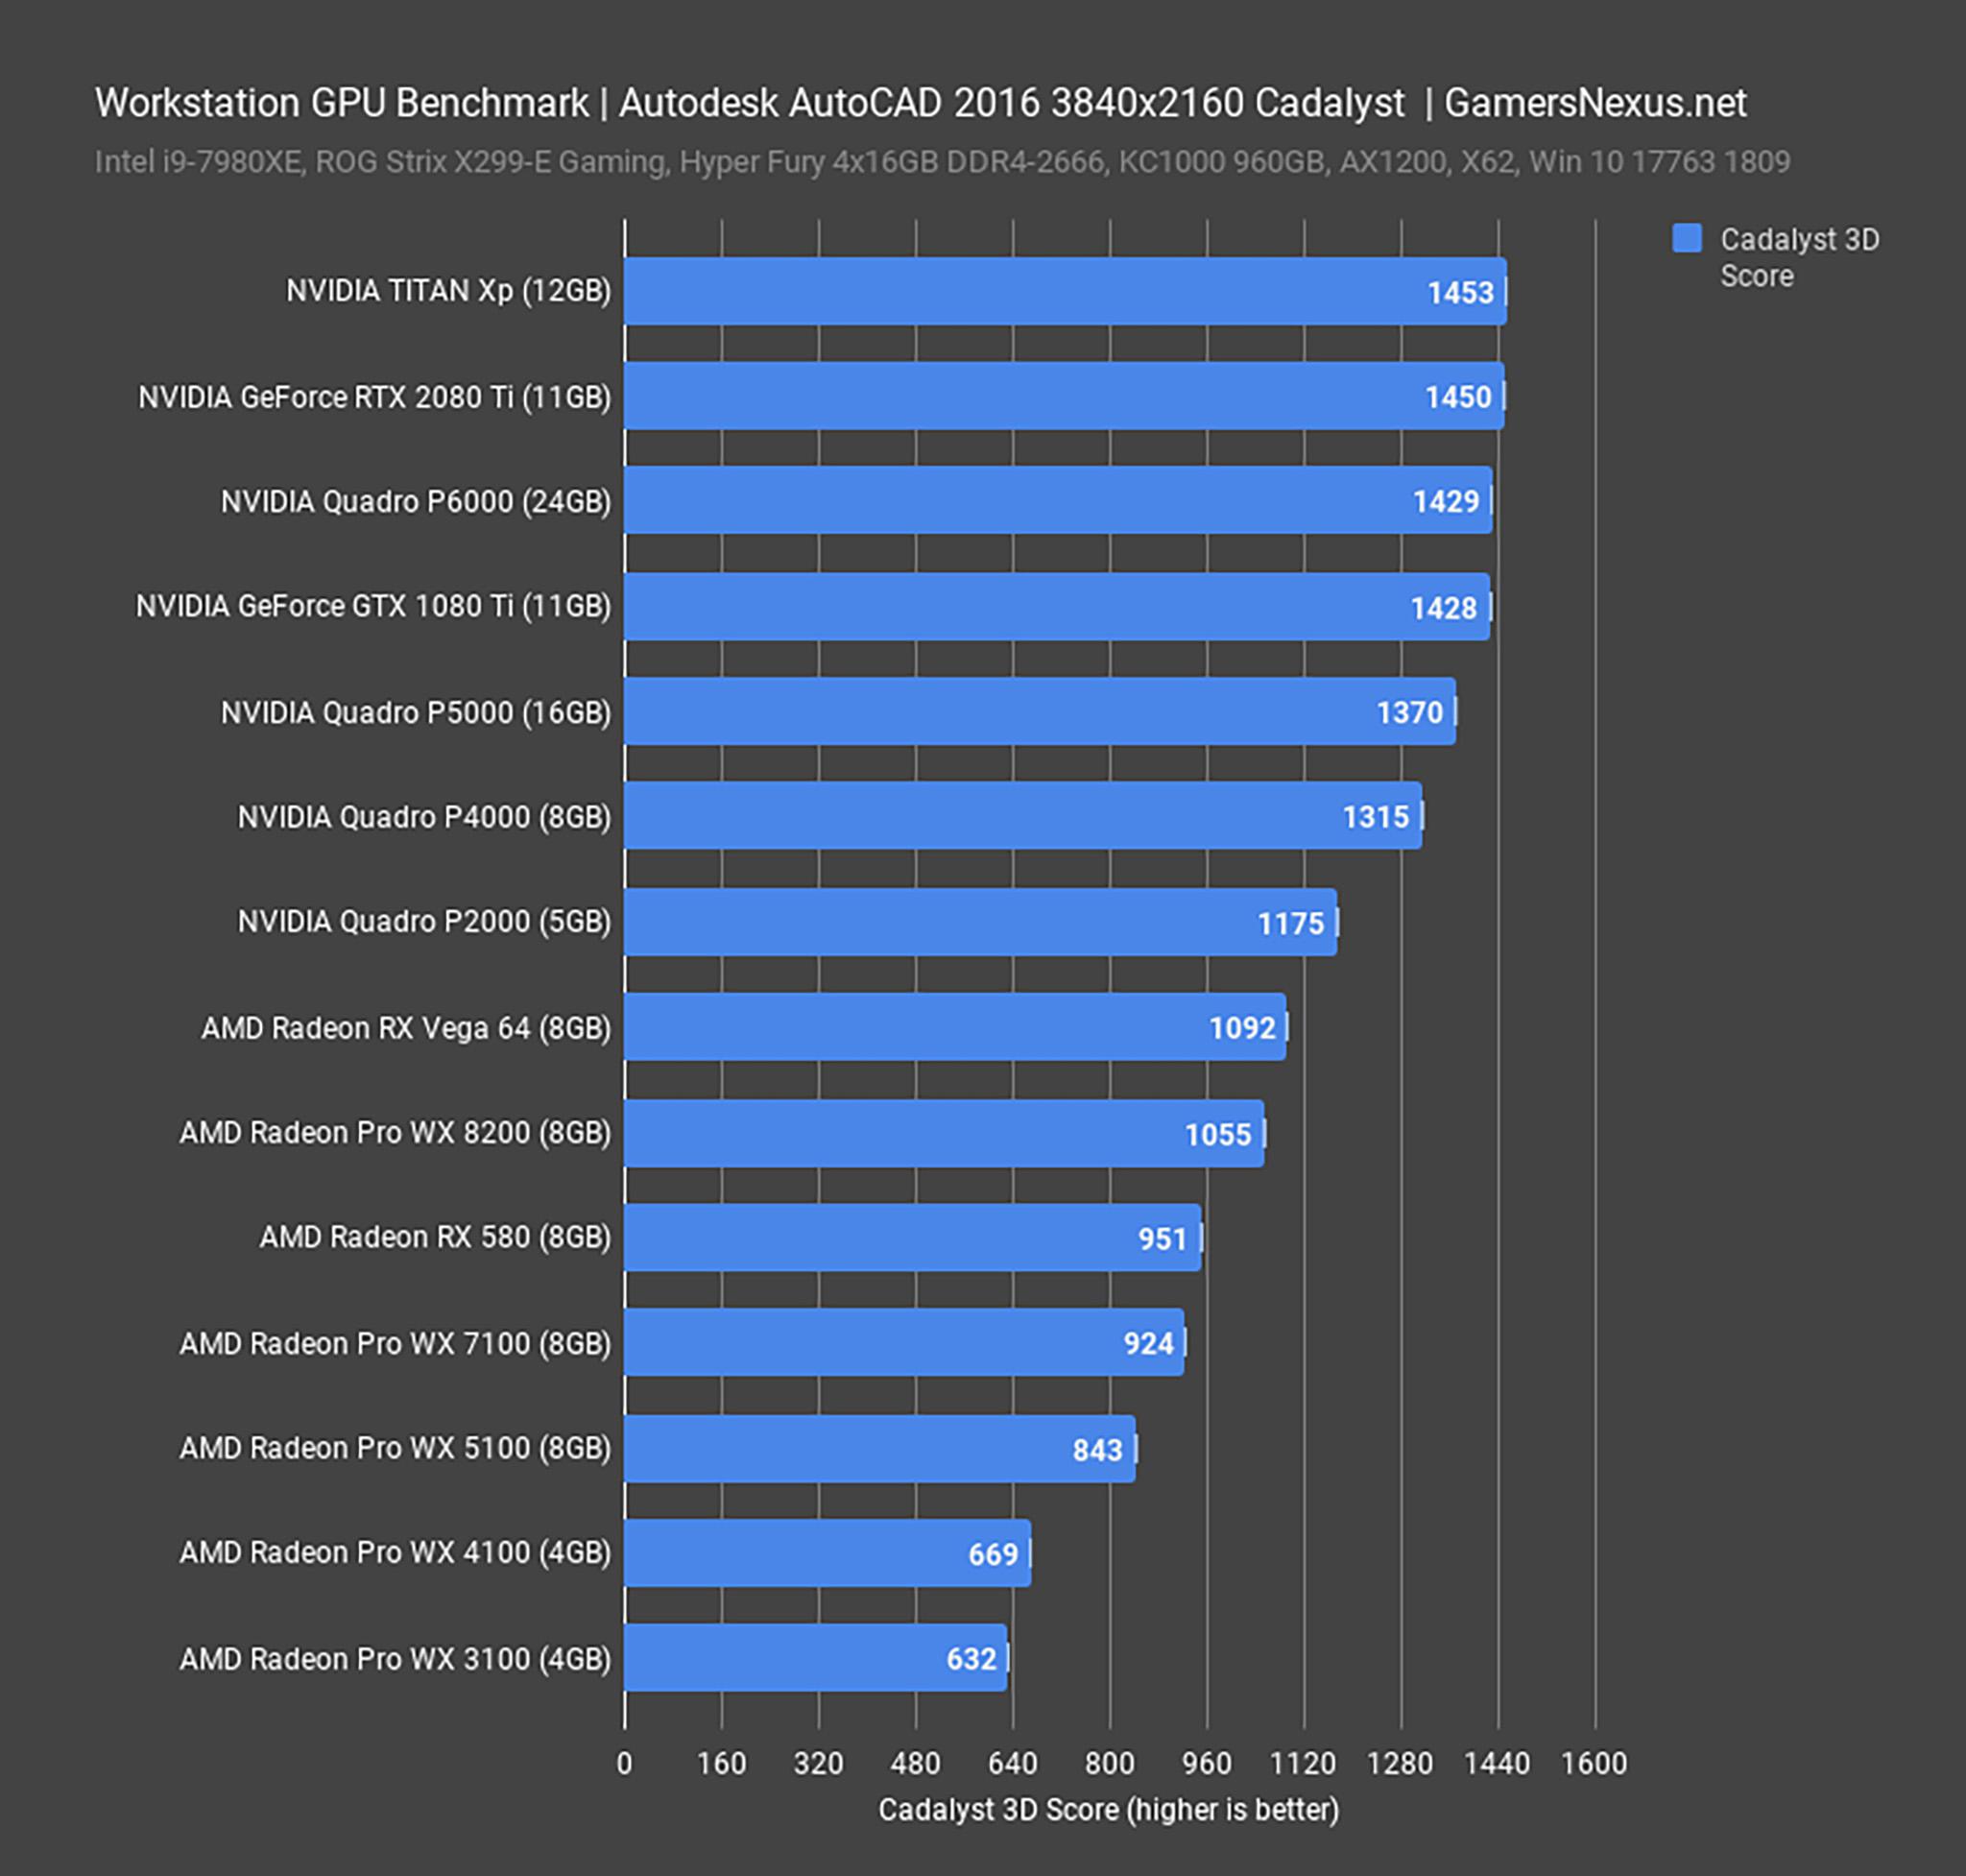 workstation-gpu-benchmark_autodesk-autocad.jpg